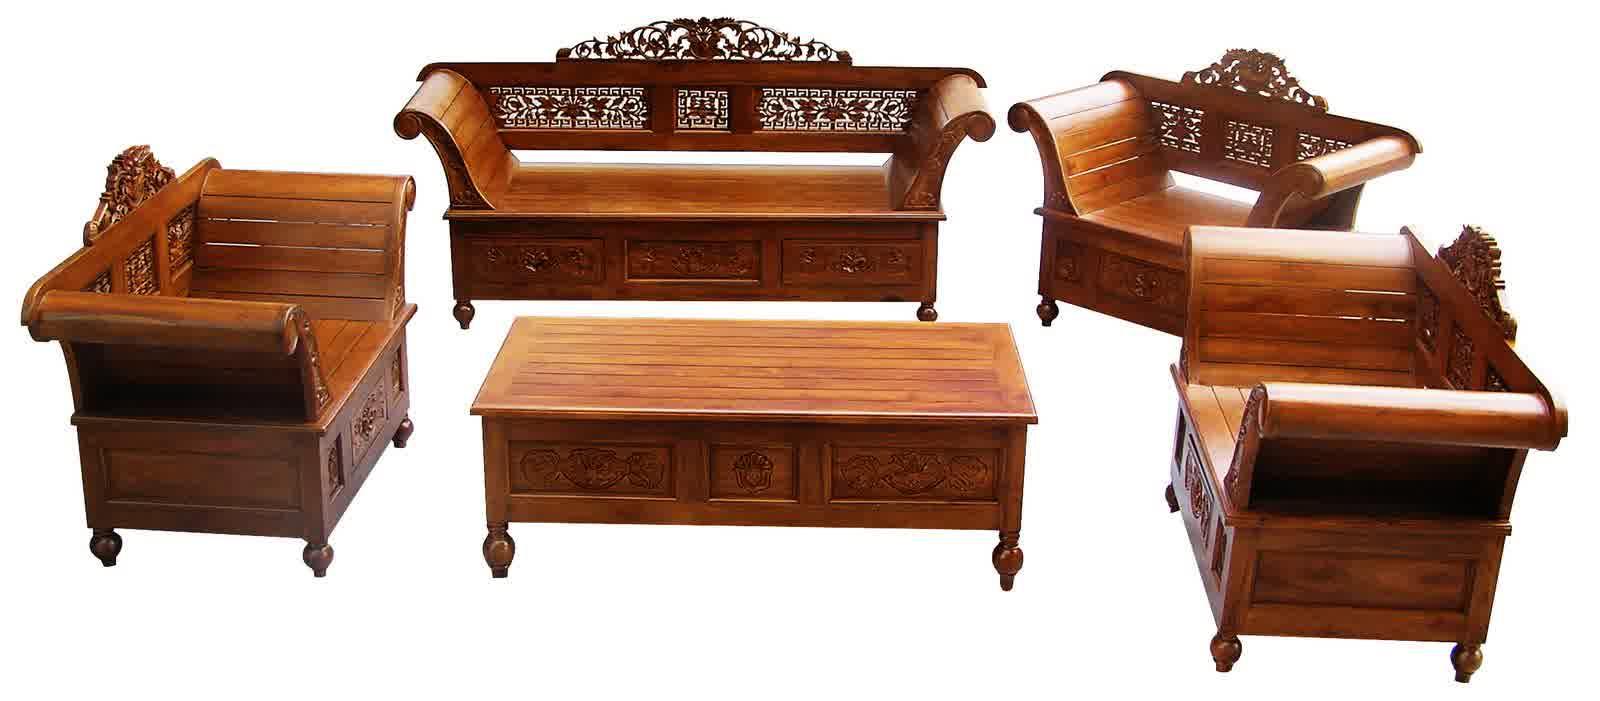 Barang Furniture Dan Mebel Kayu Perbedaan Ukiran Kayu